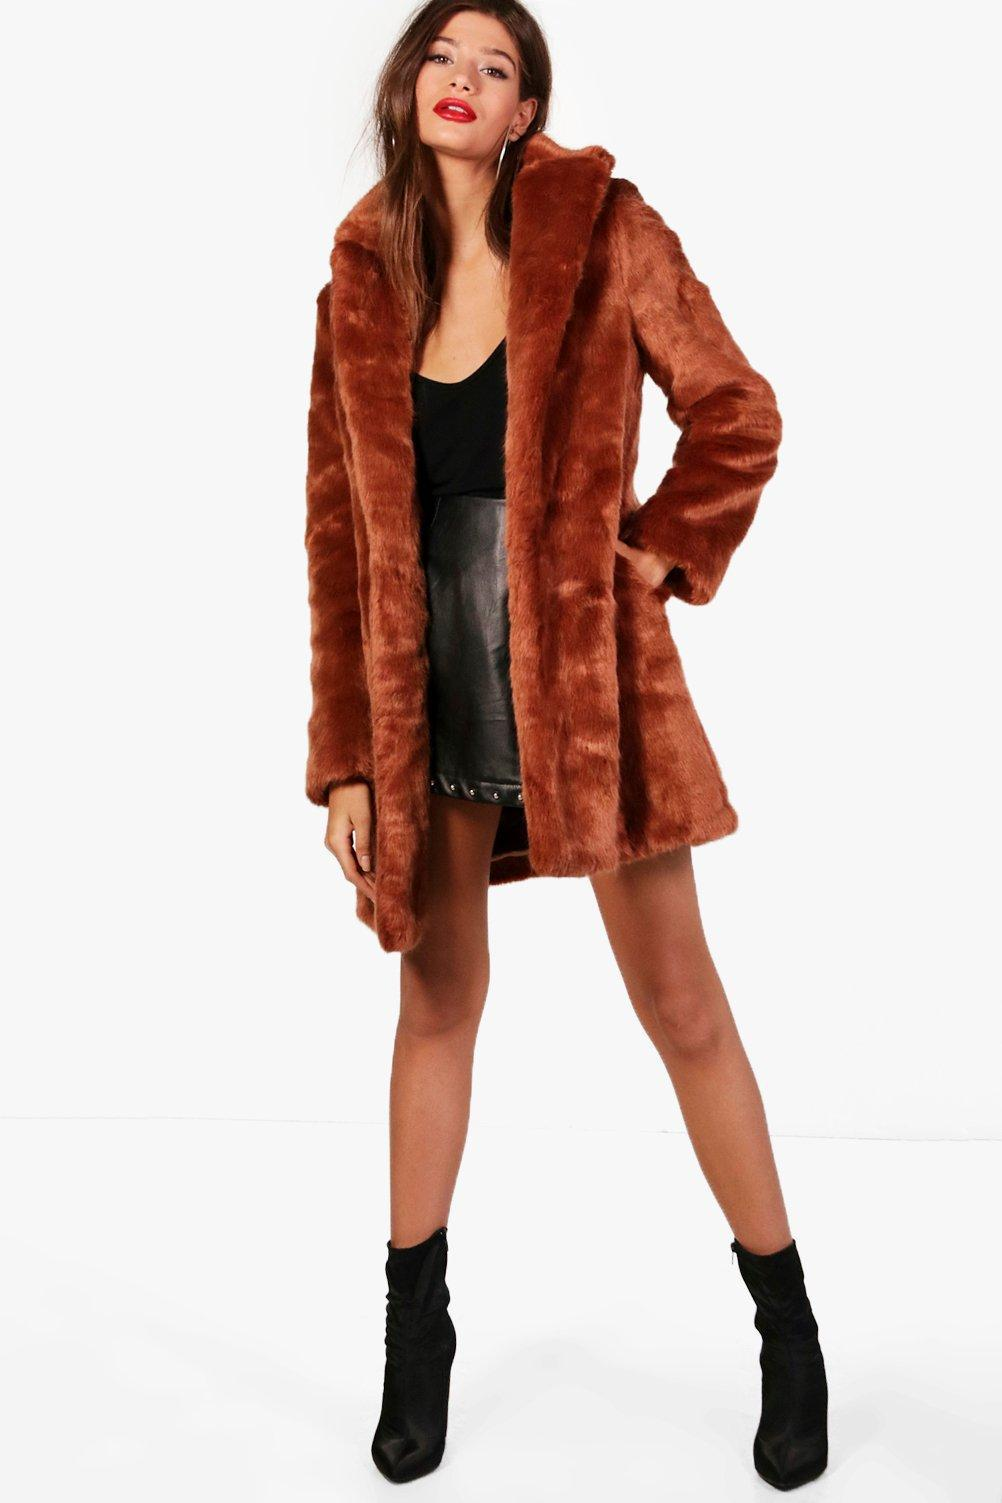 749946e4b08d Boohoo Boutique Elsie Rever Collar Faux Fur Coat in Brown - Lyst